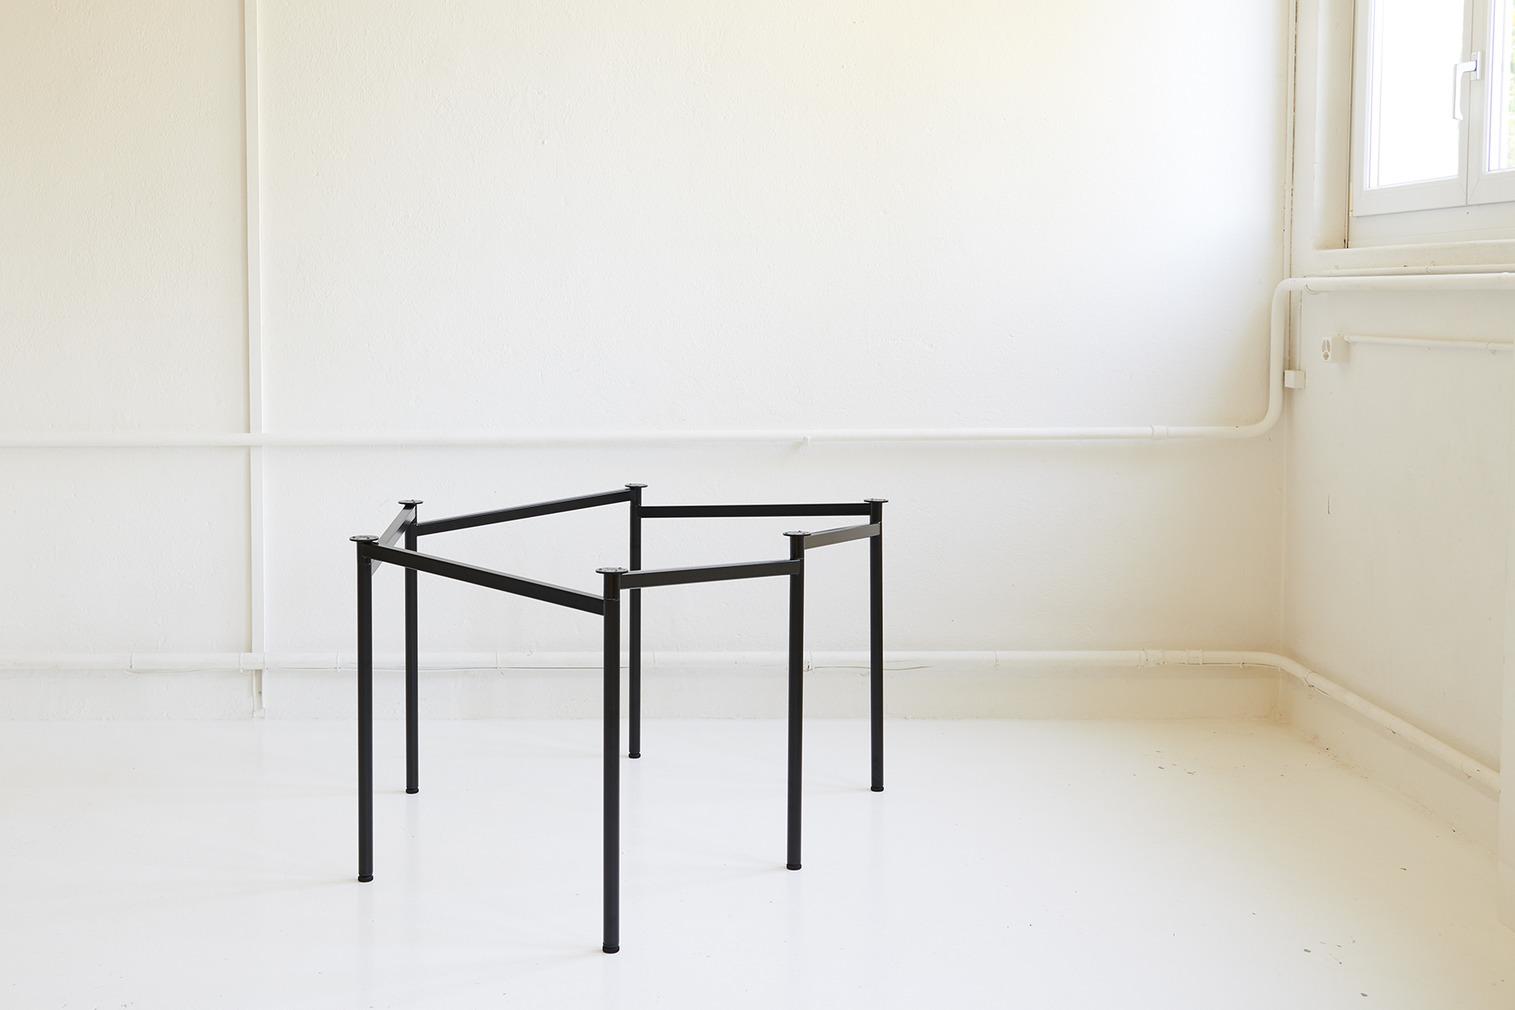 Tischgestell-System WTB WALD-HAUS